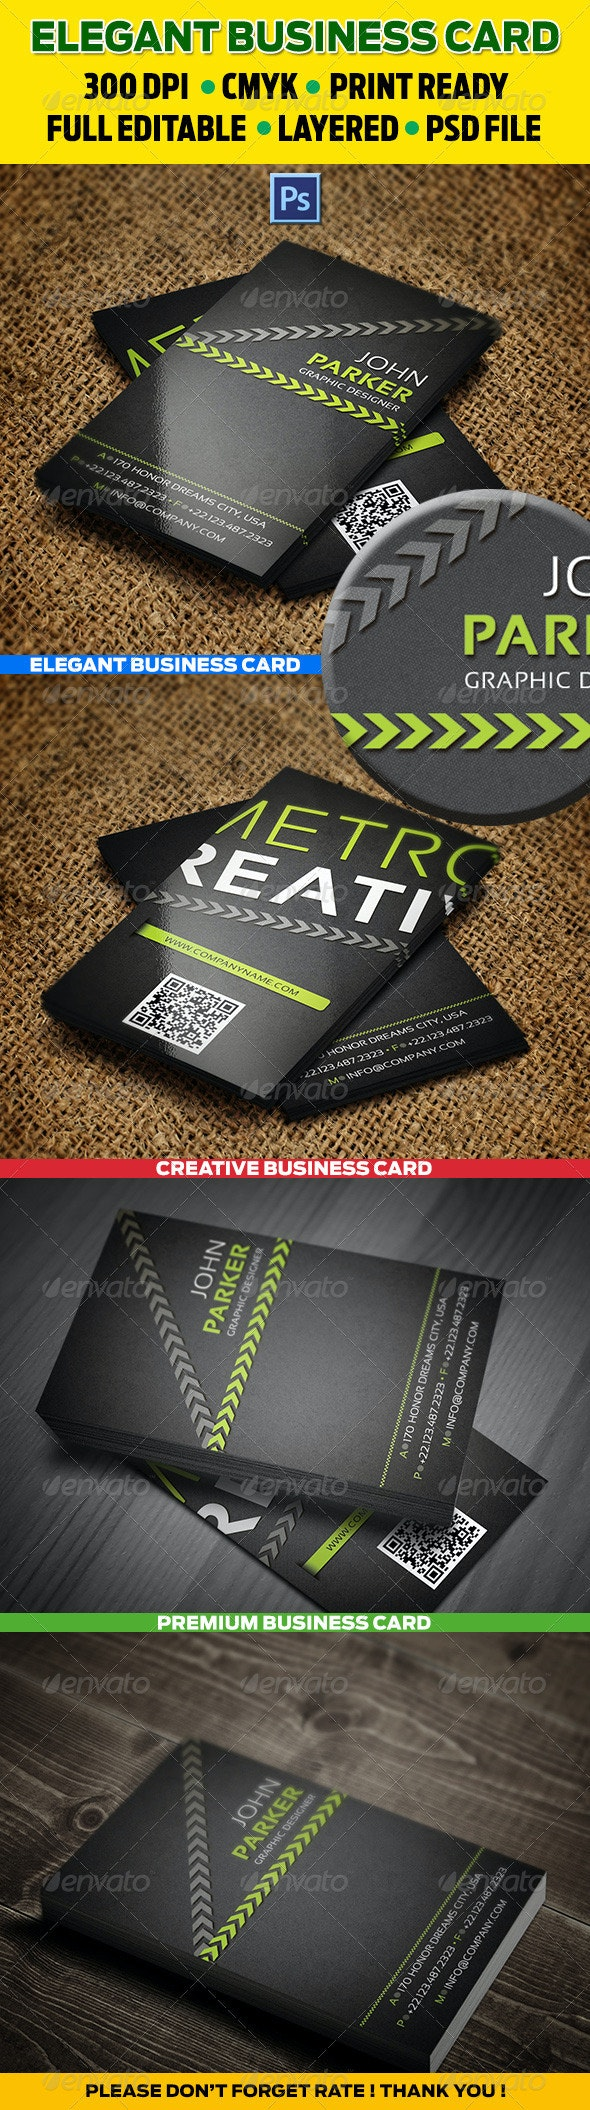 Creative Business Cards 25 - Creative Business Cards